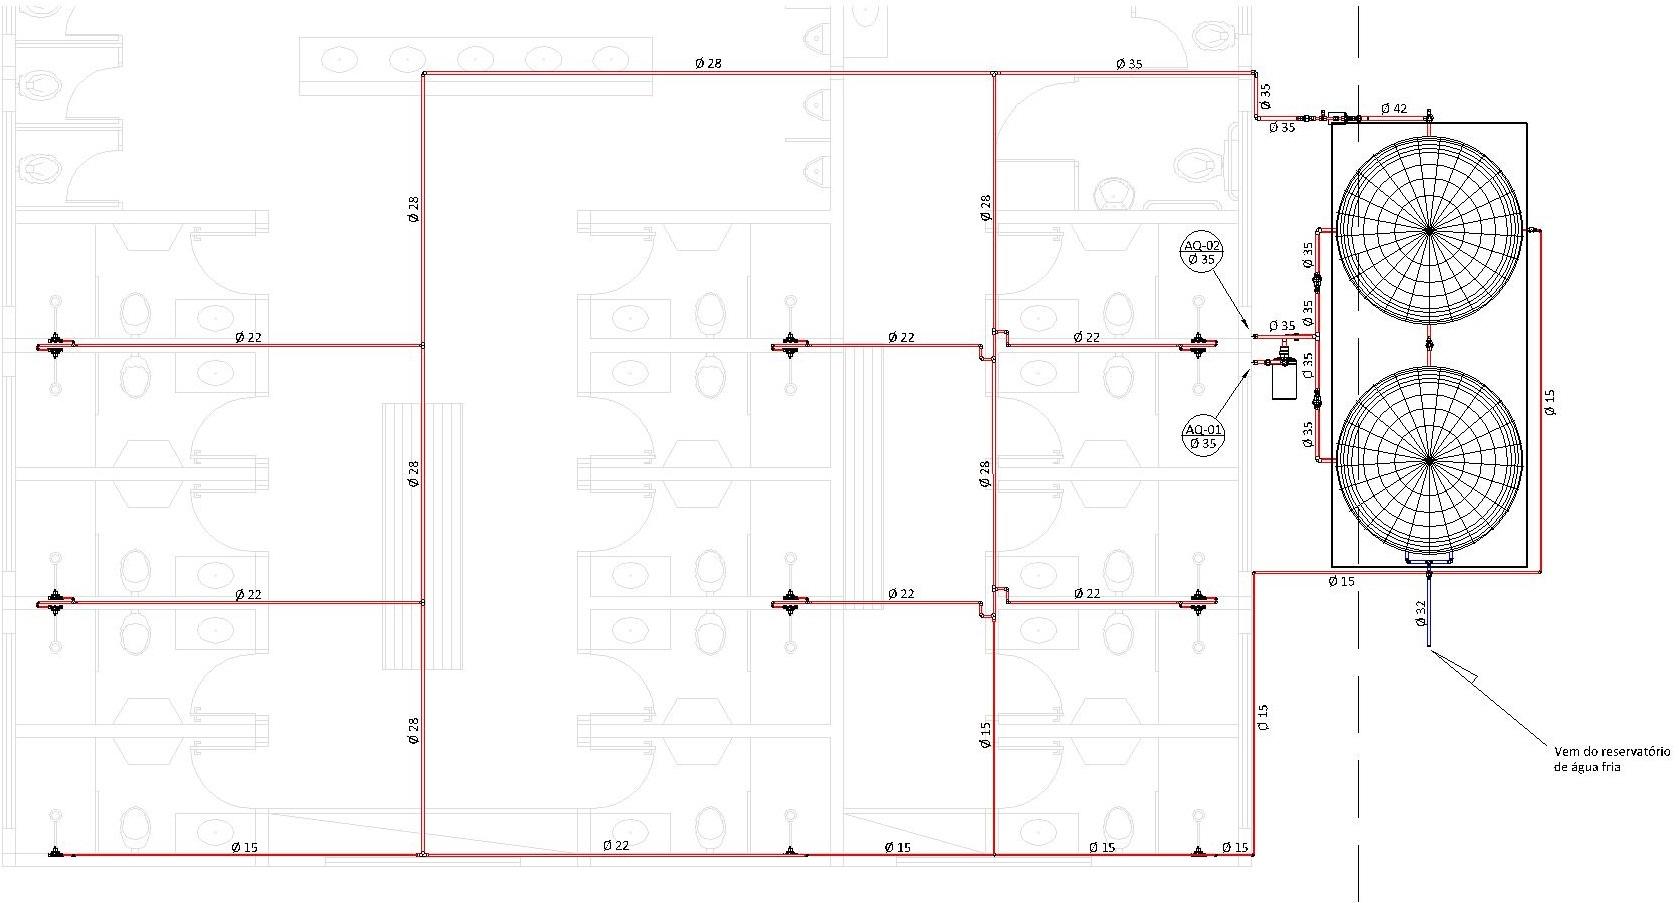 Engenharia (11).jpg